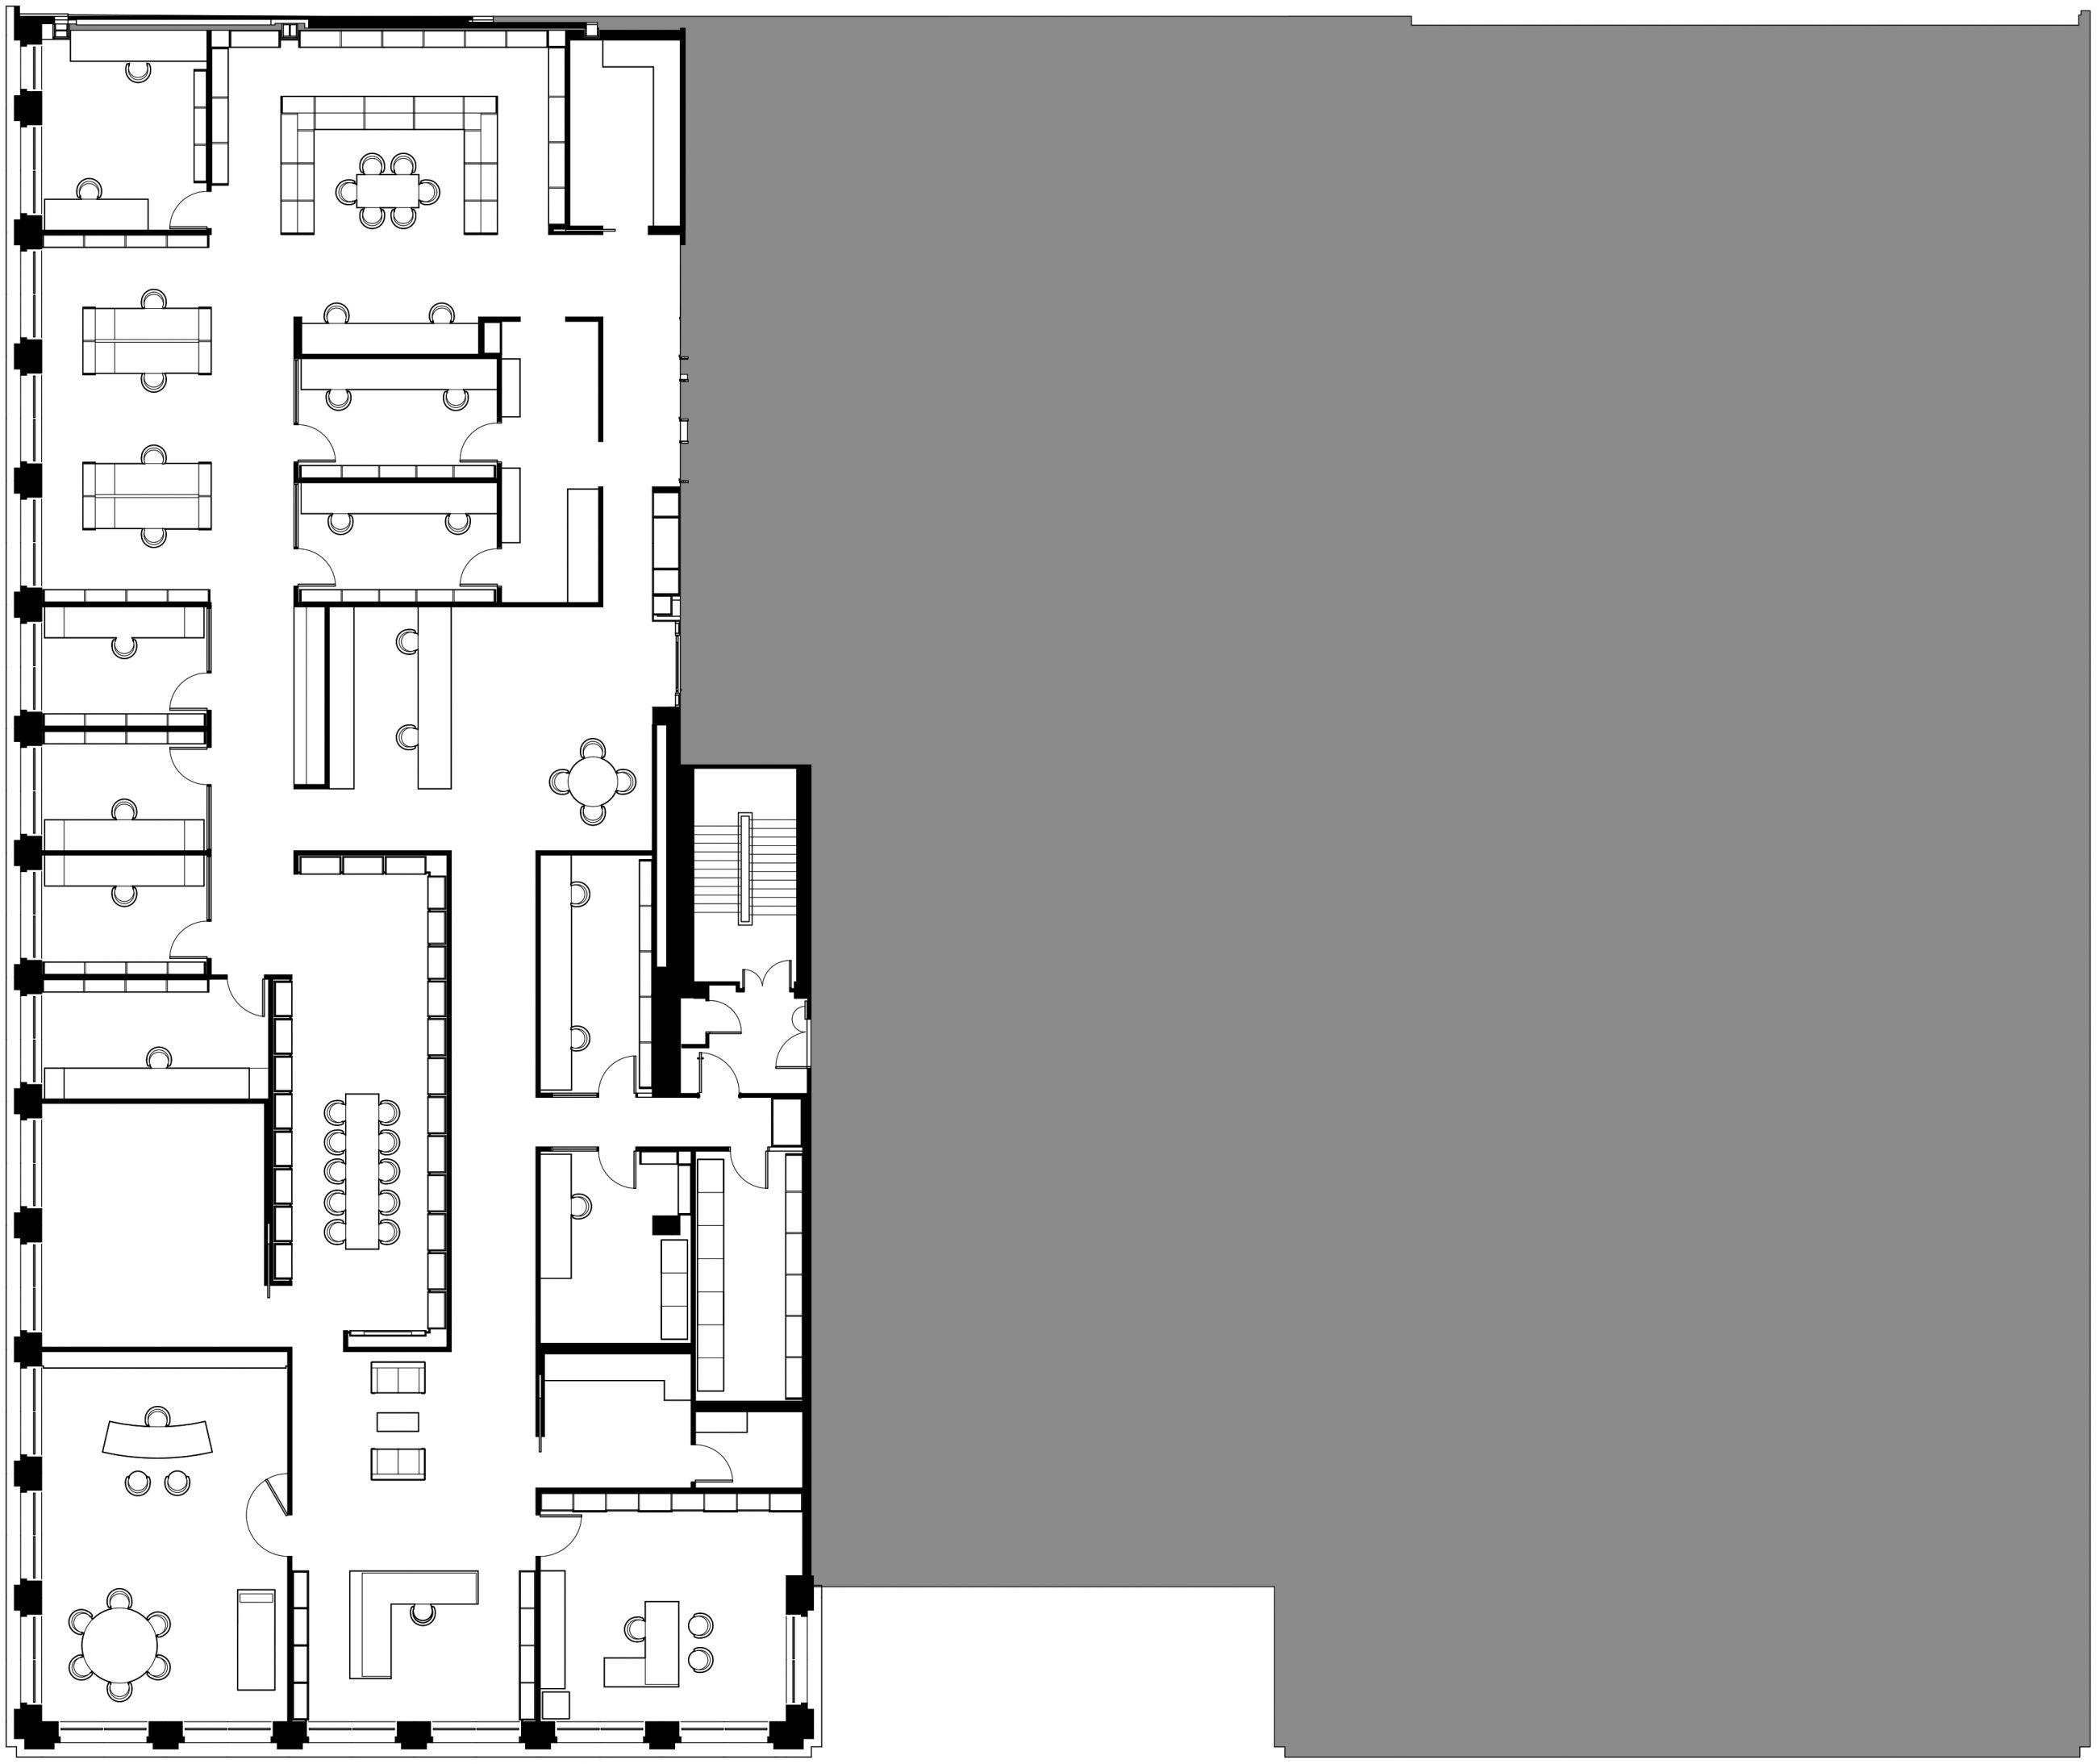 Hauser & Wirth Savile Row 2nd Floor Plan